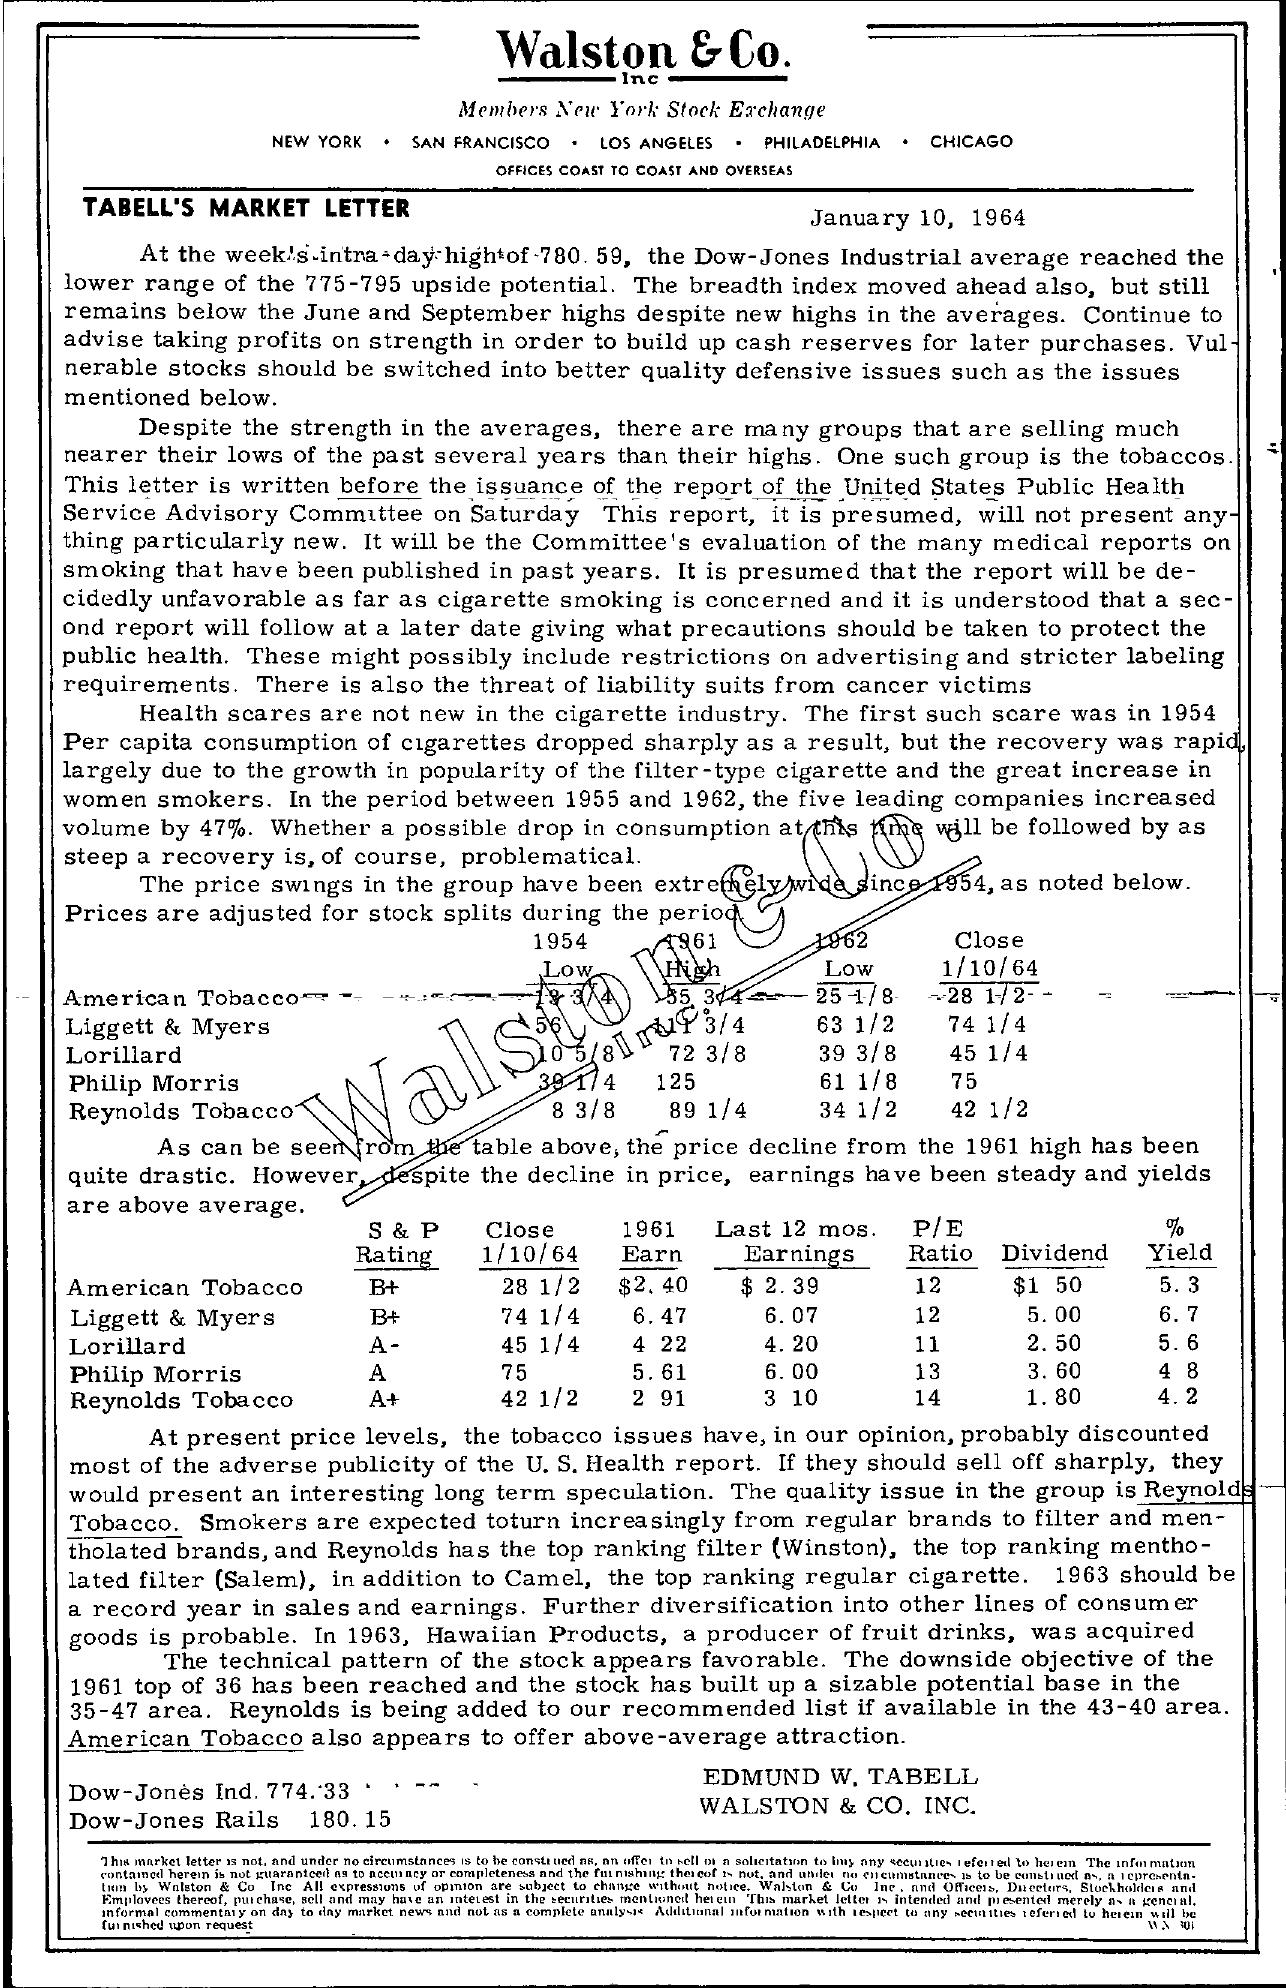 Tabell's Market Letter - January 10, 1964